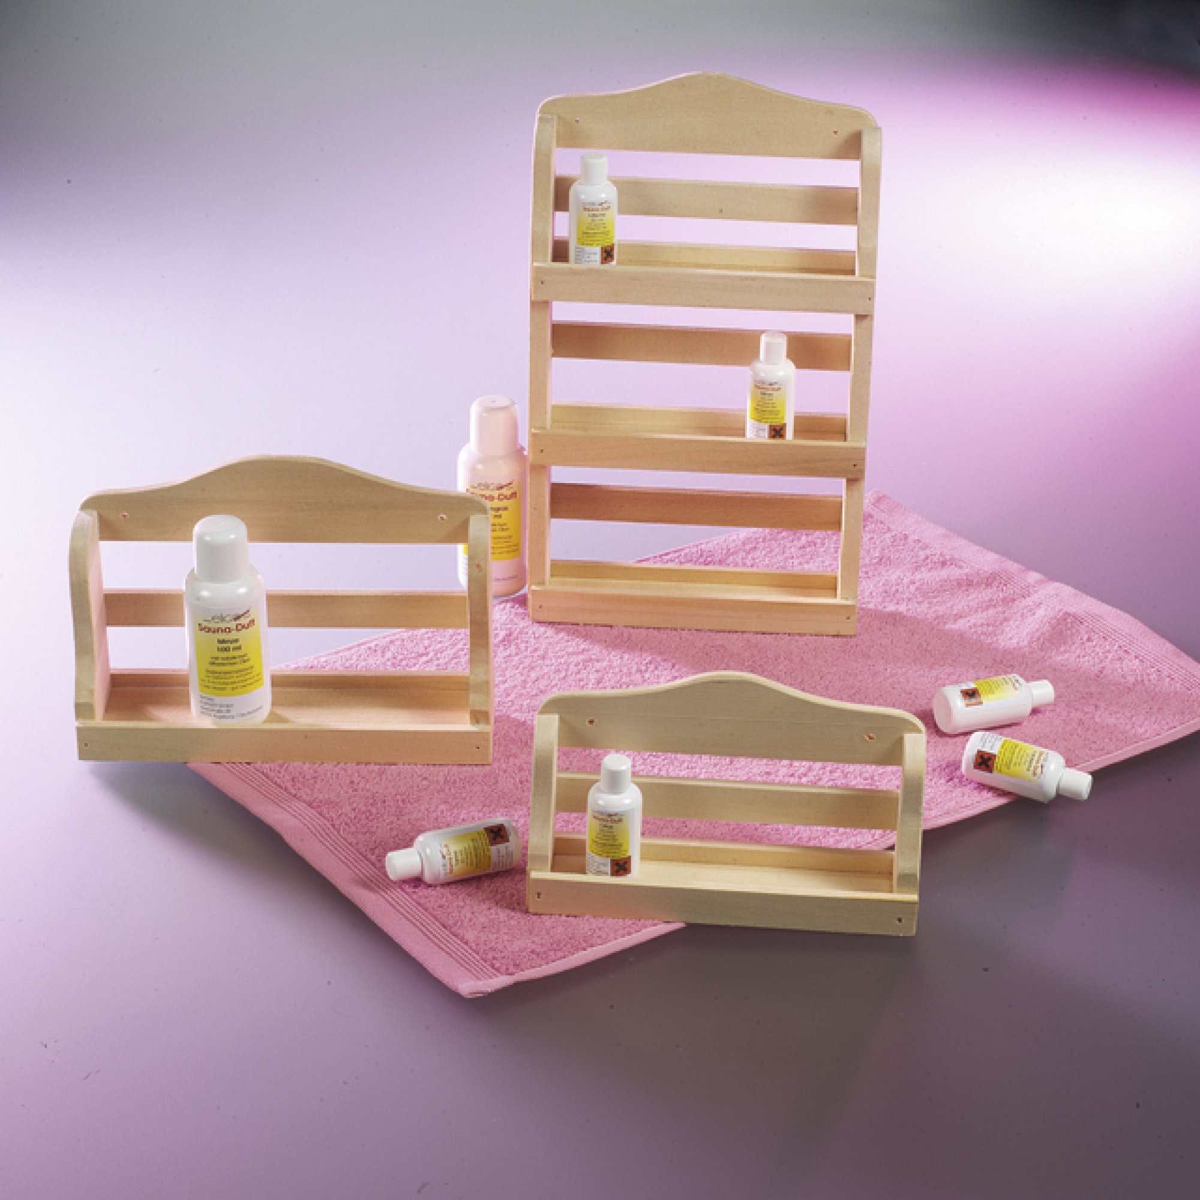 wandregal aus holz natur breite 21 cm 6 50. Black Bedroom Furniture Sets. Home Design Ideas